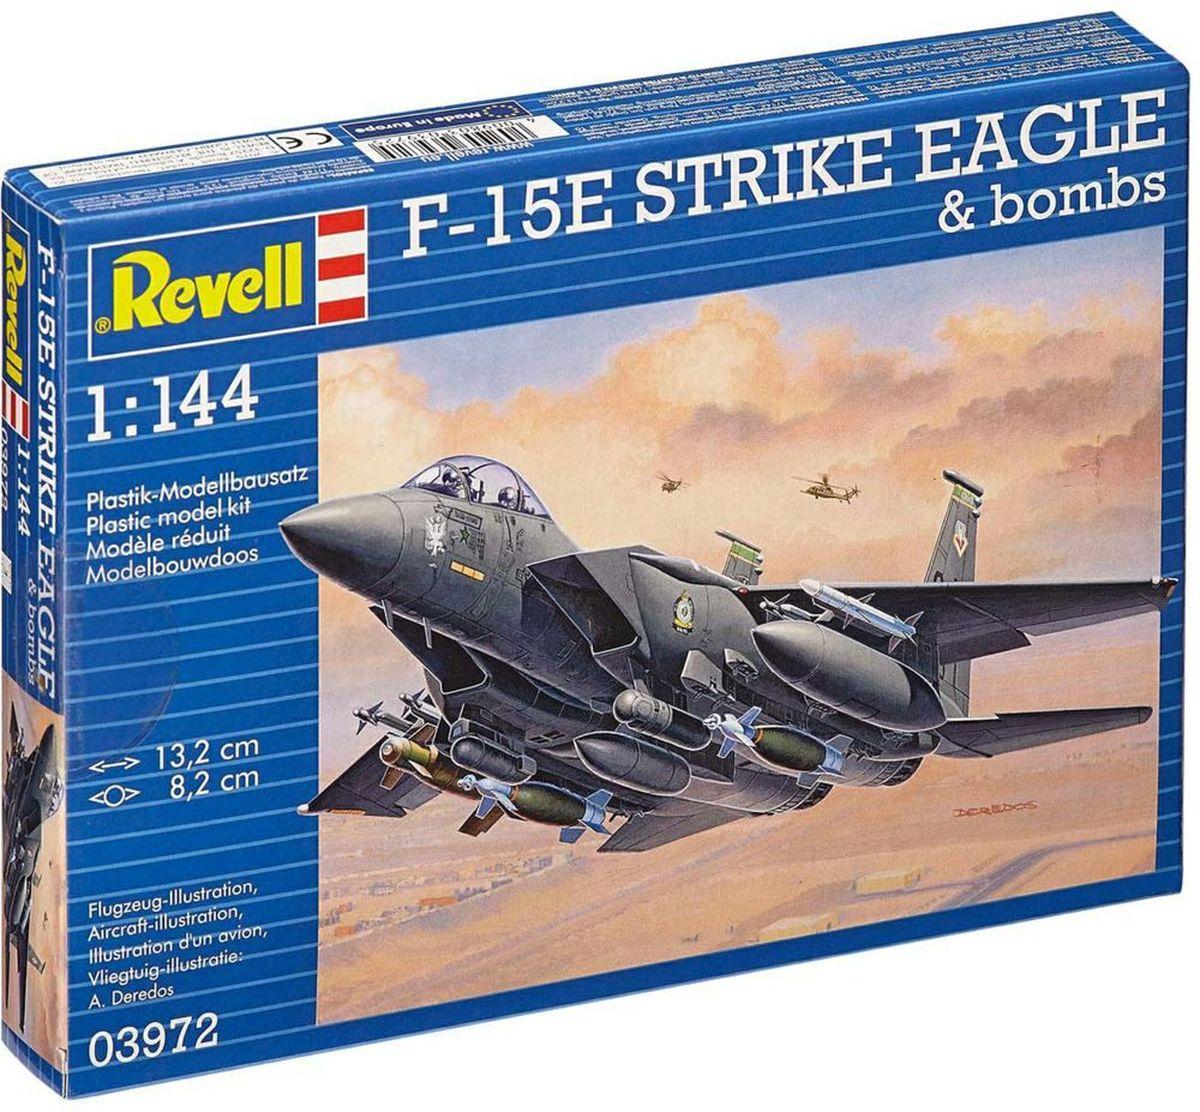 Revell Сборная модель Самолет F-15E Strike Eagle & Bombs